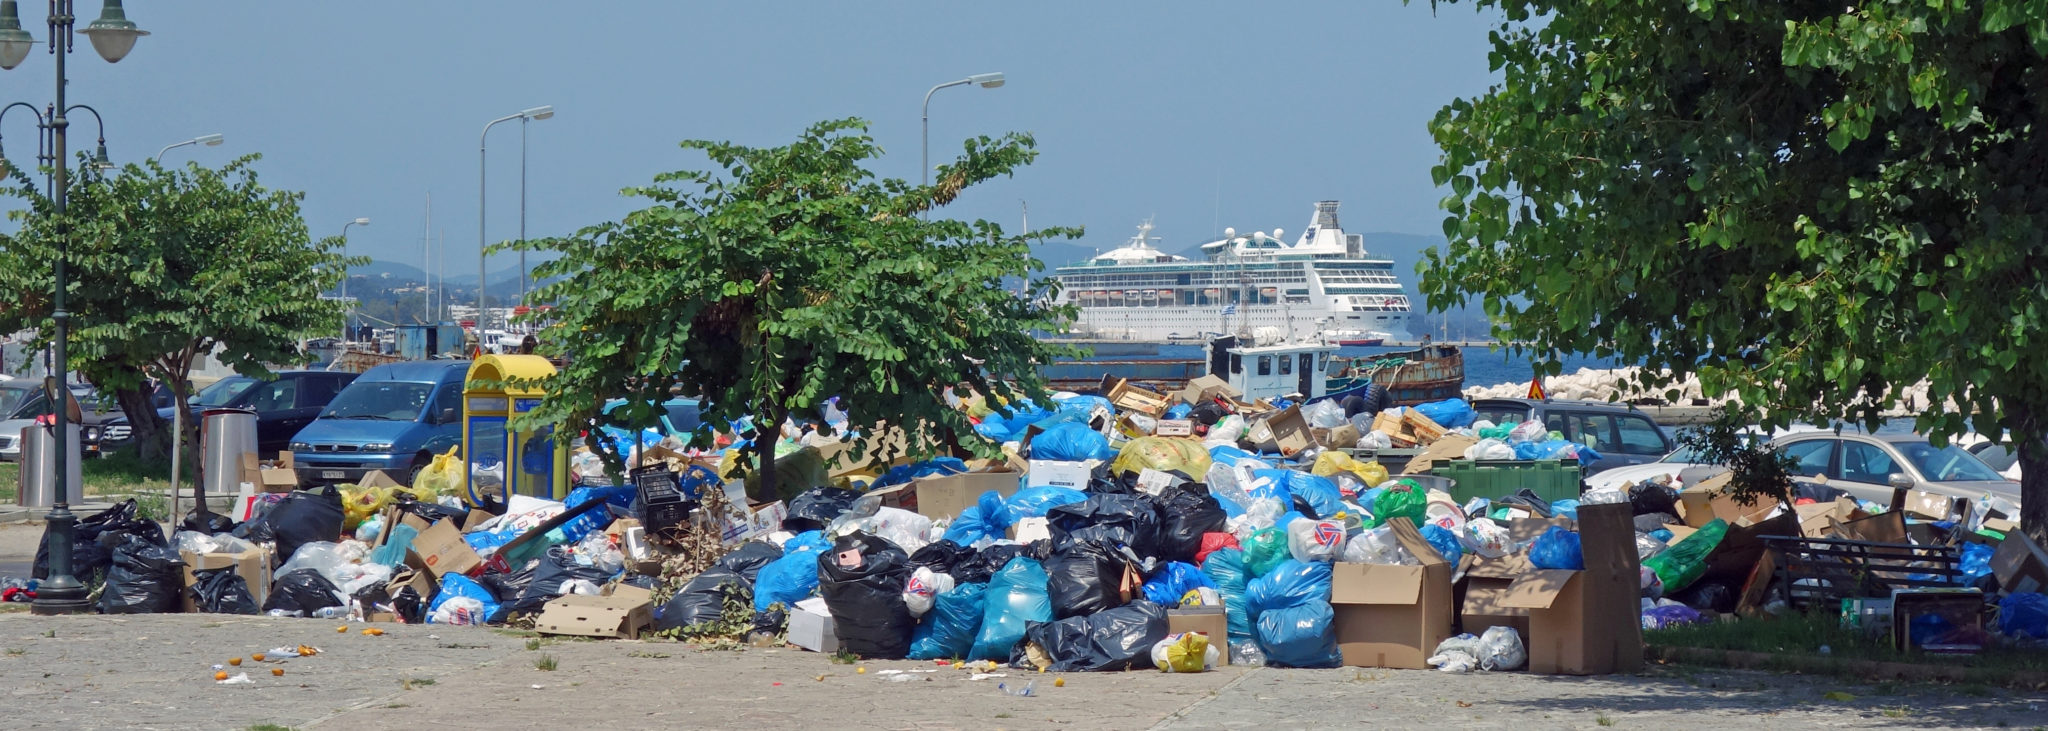 Photo of 7 χιλ τόννοι σκουπίδια στους δρόμους της Κέρκυρας. Κινδυνεύει να διαλυθεί η οικονομία και κίνδυνος μολύνσεων …Mυρίζει μπαρούτι!!!